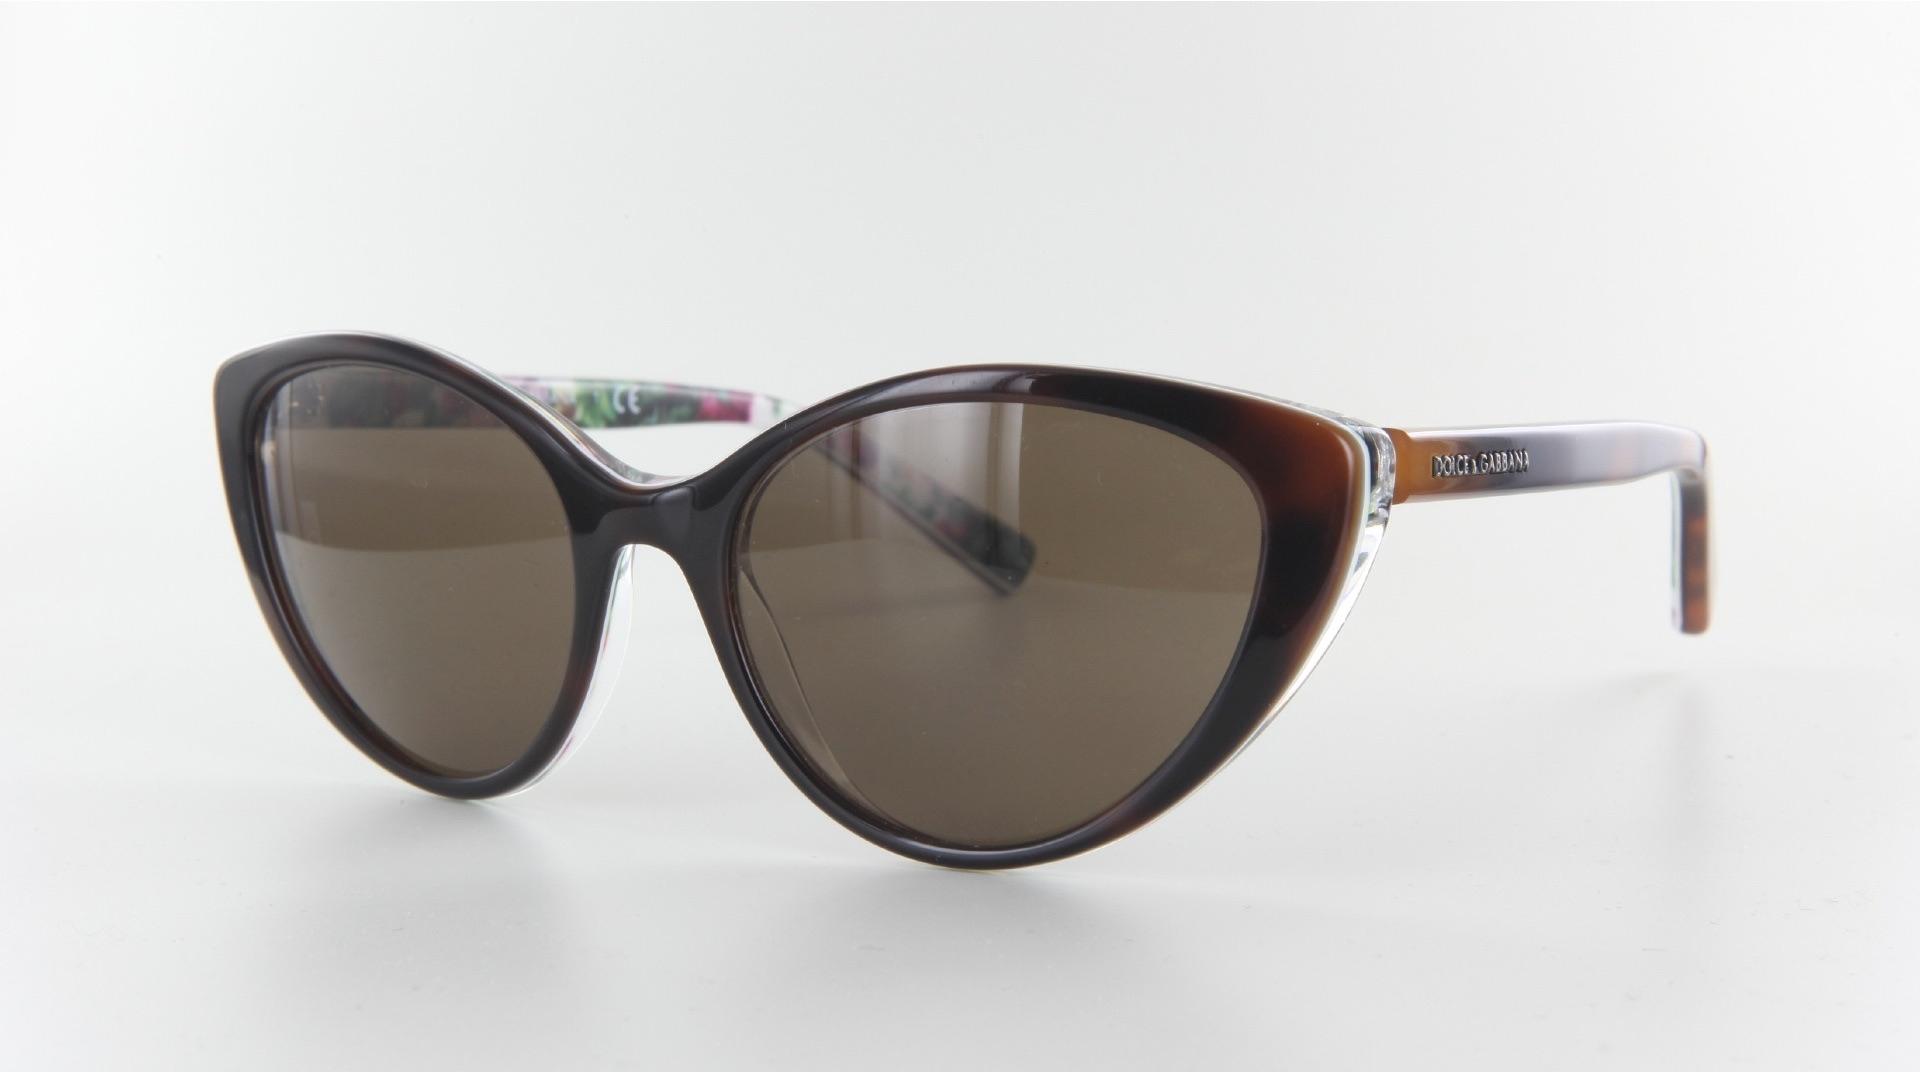 Dolce & Gabbana - ref: 70439